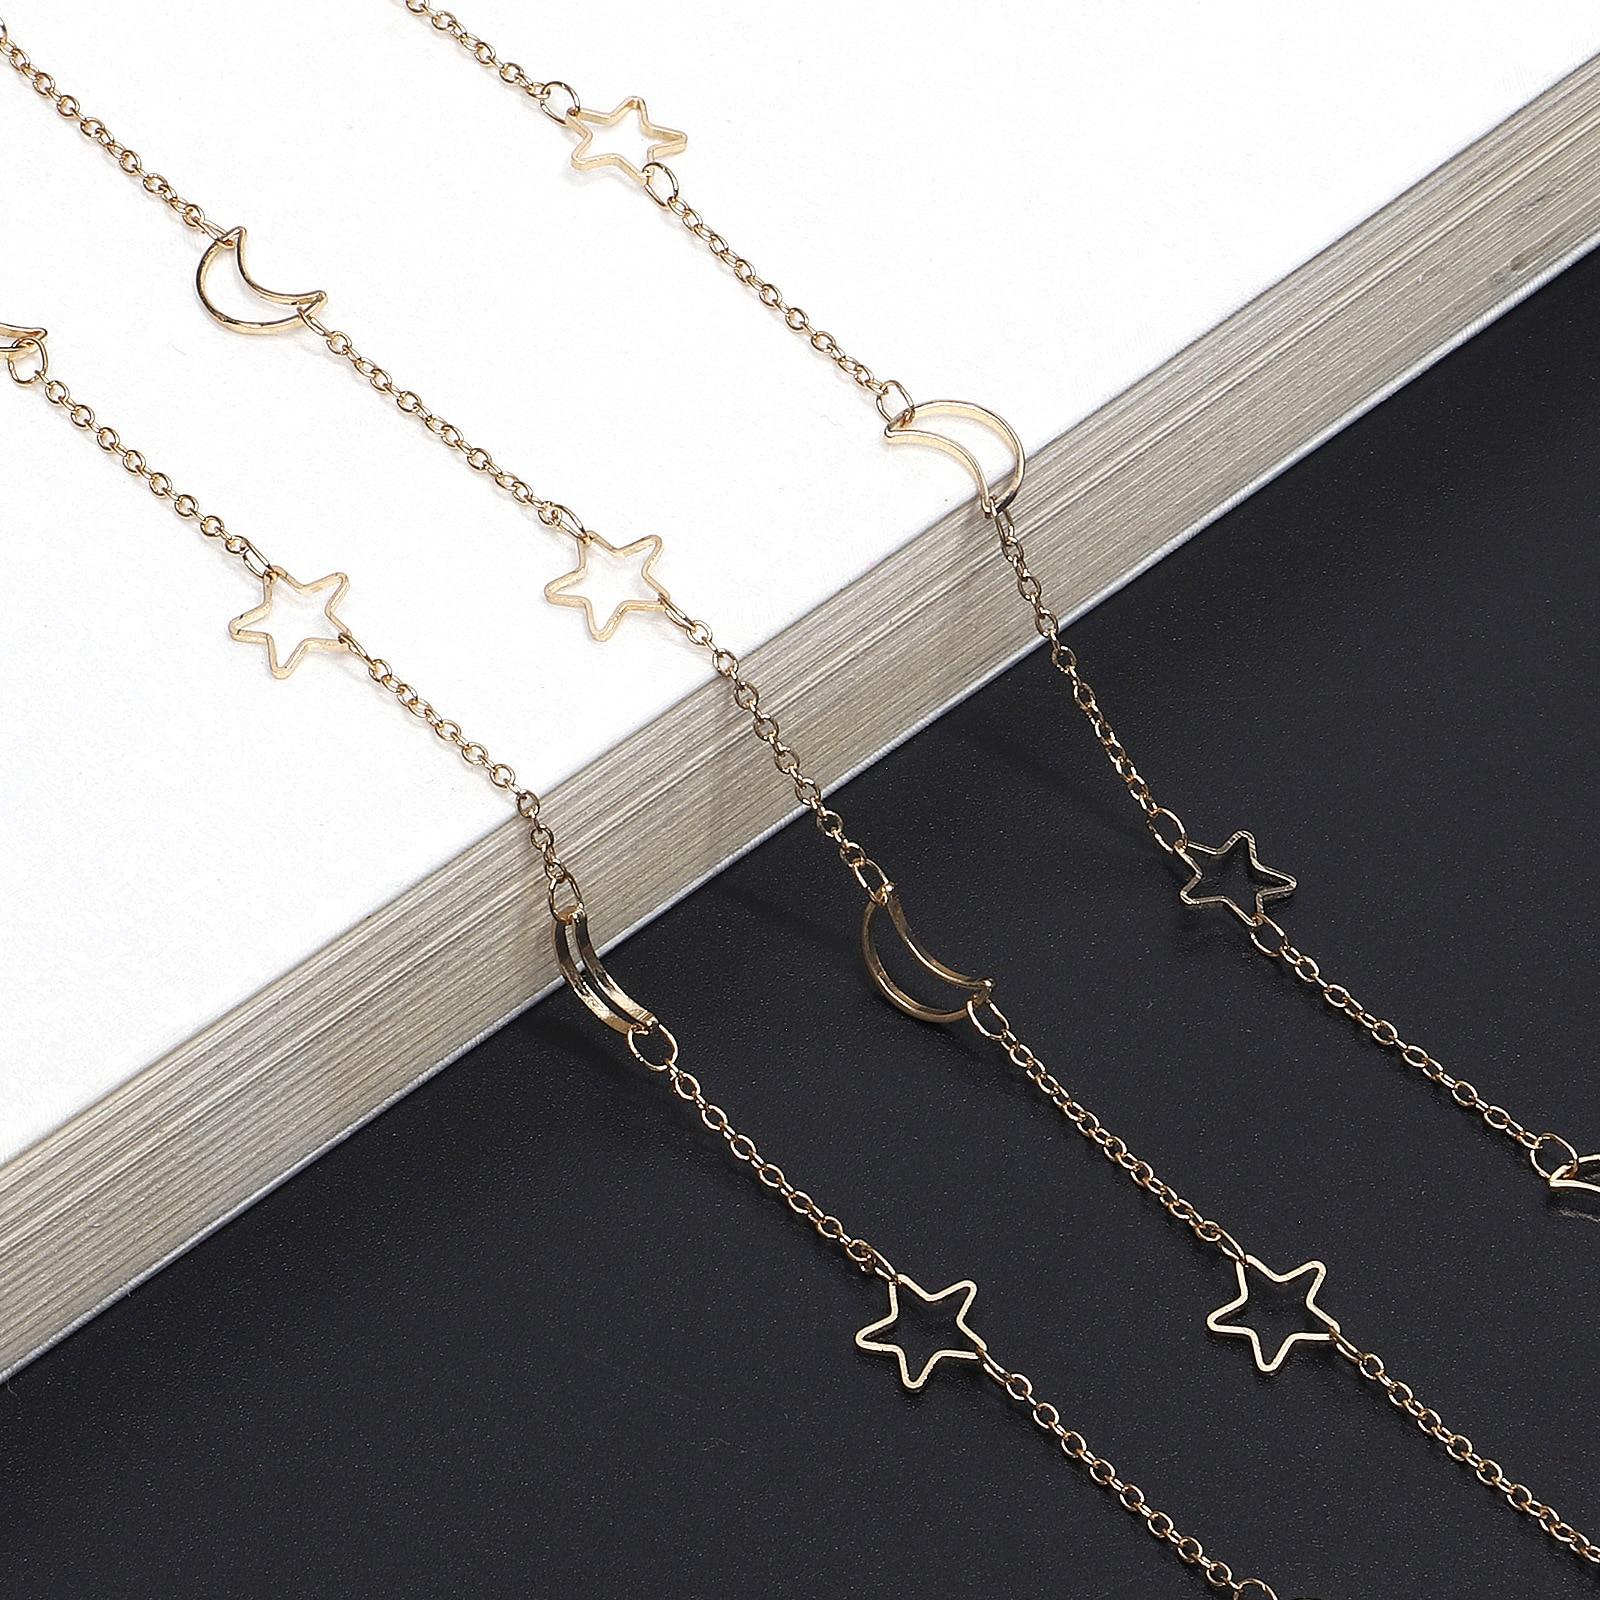 New Design Moon Star Eyeglasses Chain Eyewears Cord Holder Neck Strap Non-slip Sunglasses Chain For Women Necklace Korea Style